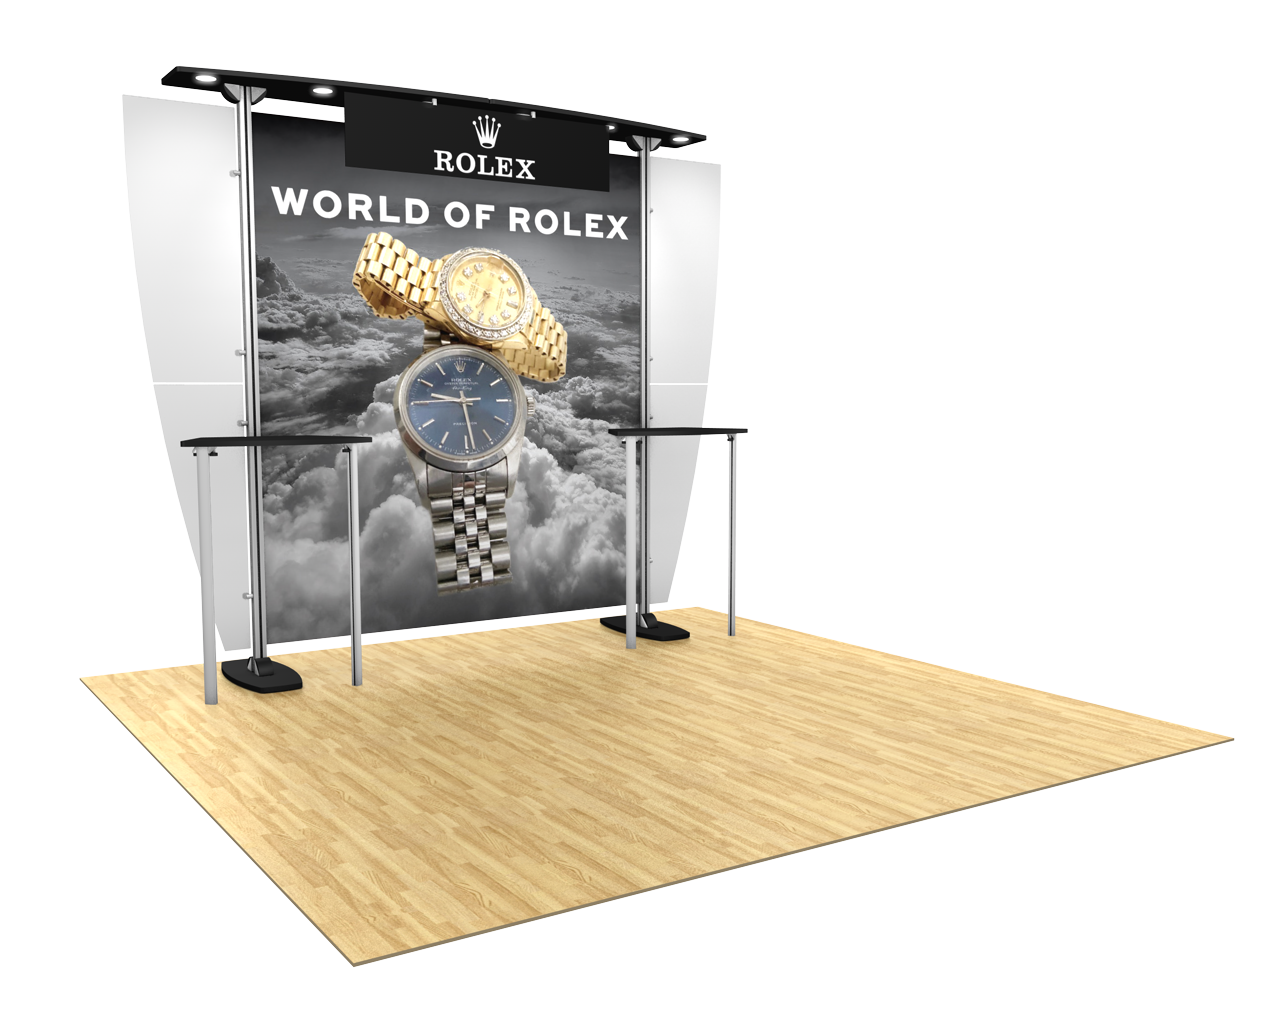 Exhibitline 10x10 Trade Show Display - ex1 Model